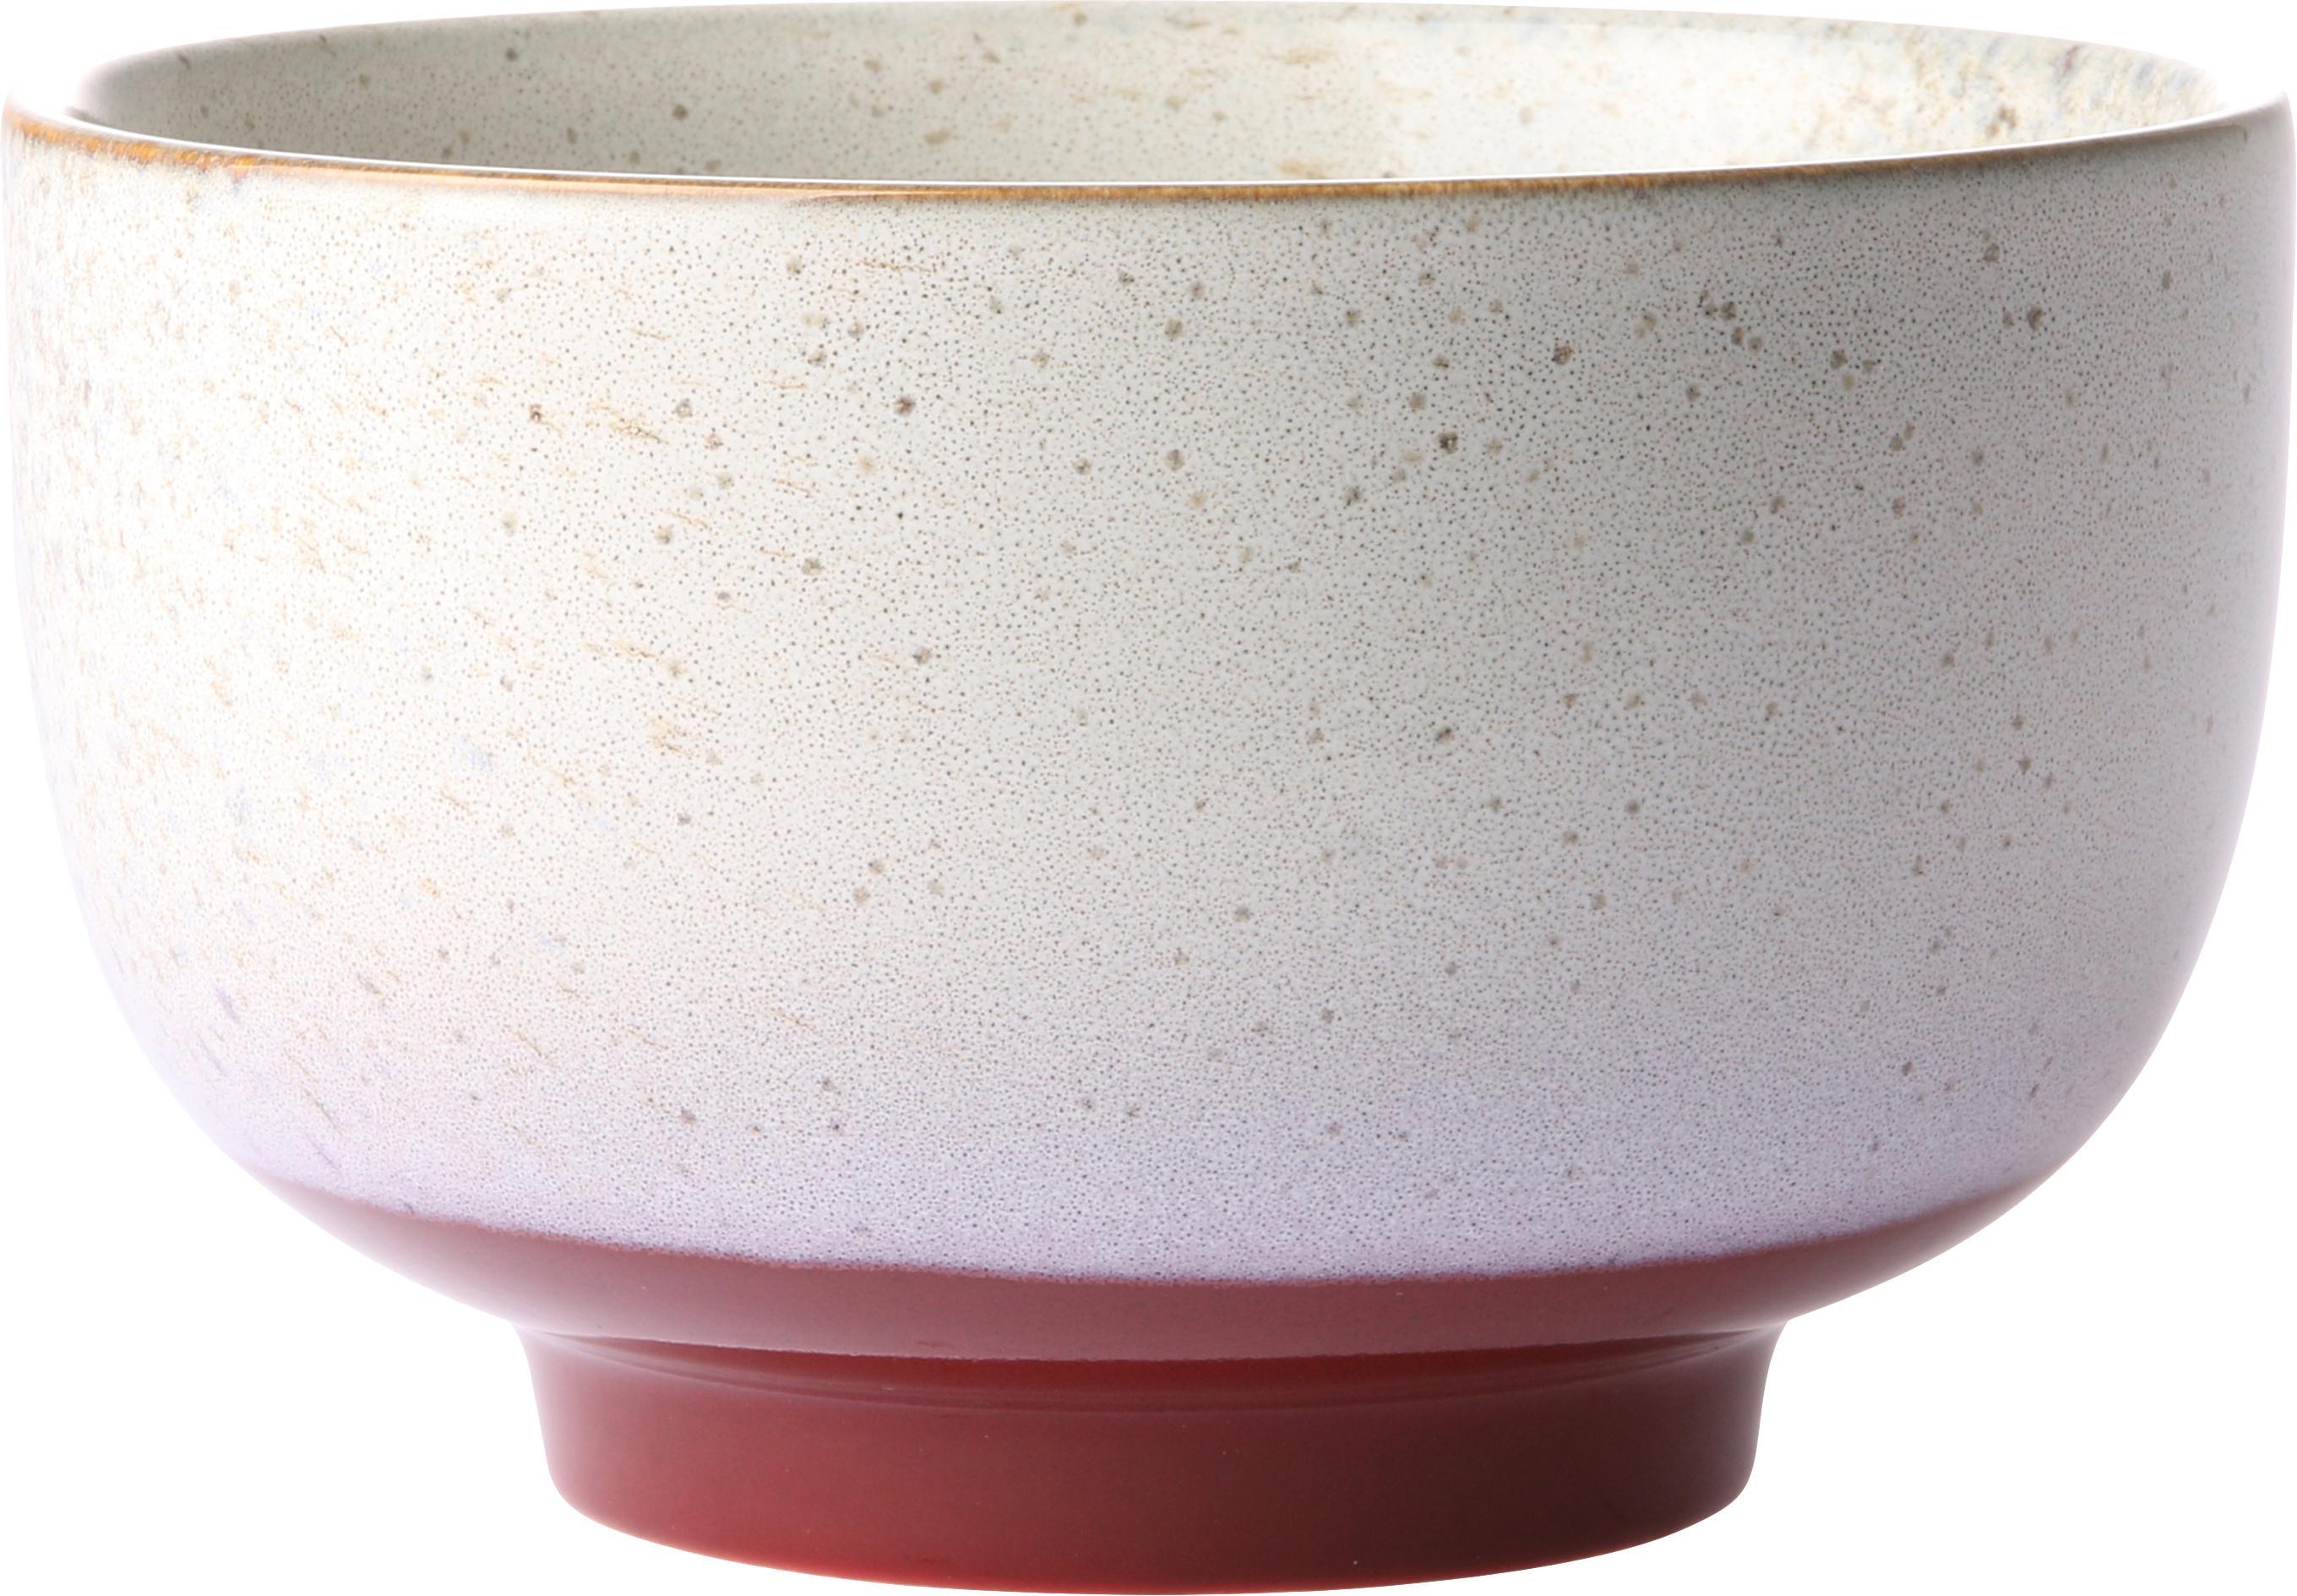 Set 4 ciotole artigianali 70's, Ceramica, Multicolore, Ø 14 x Alt. 8 cm